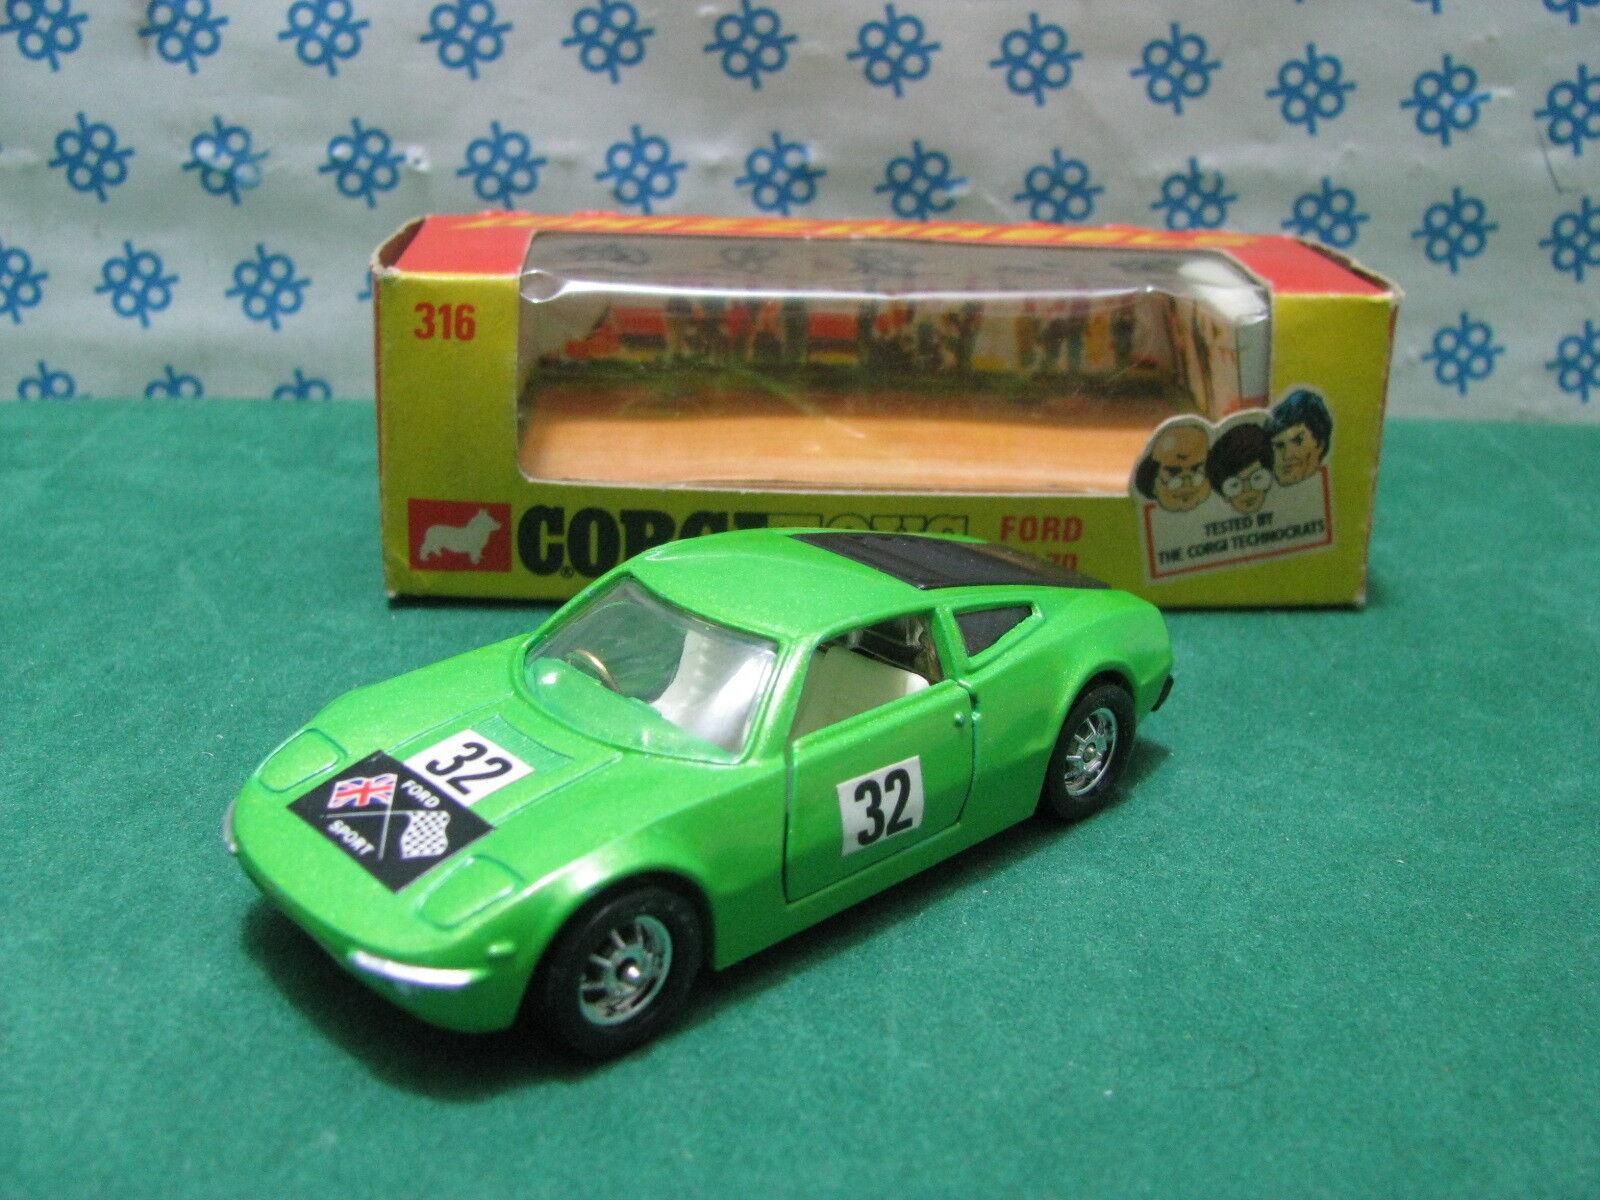 Vintage-Ford GT 70-Corgi Toys 316 MIB